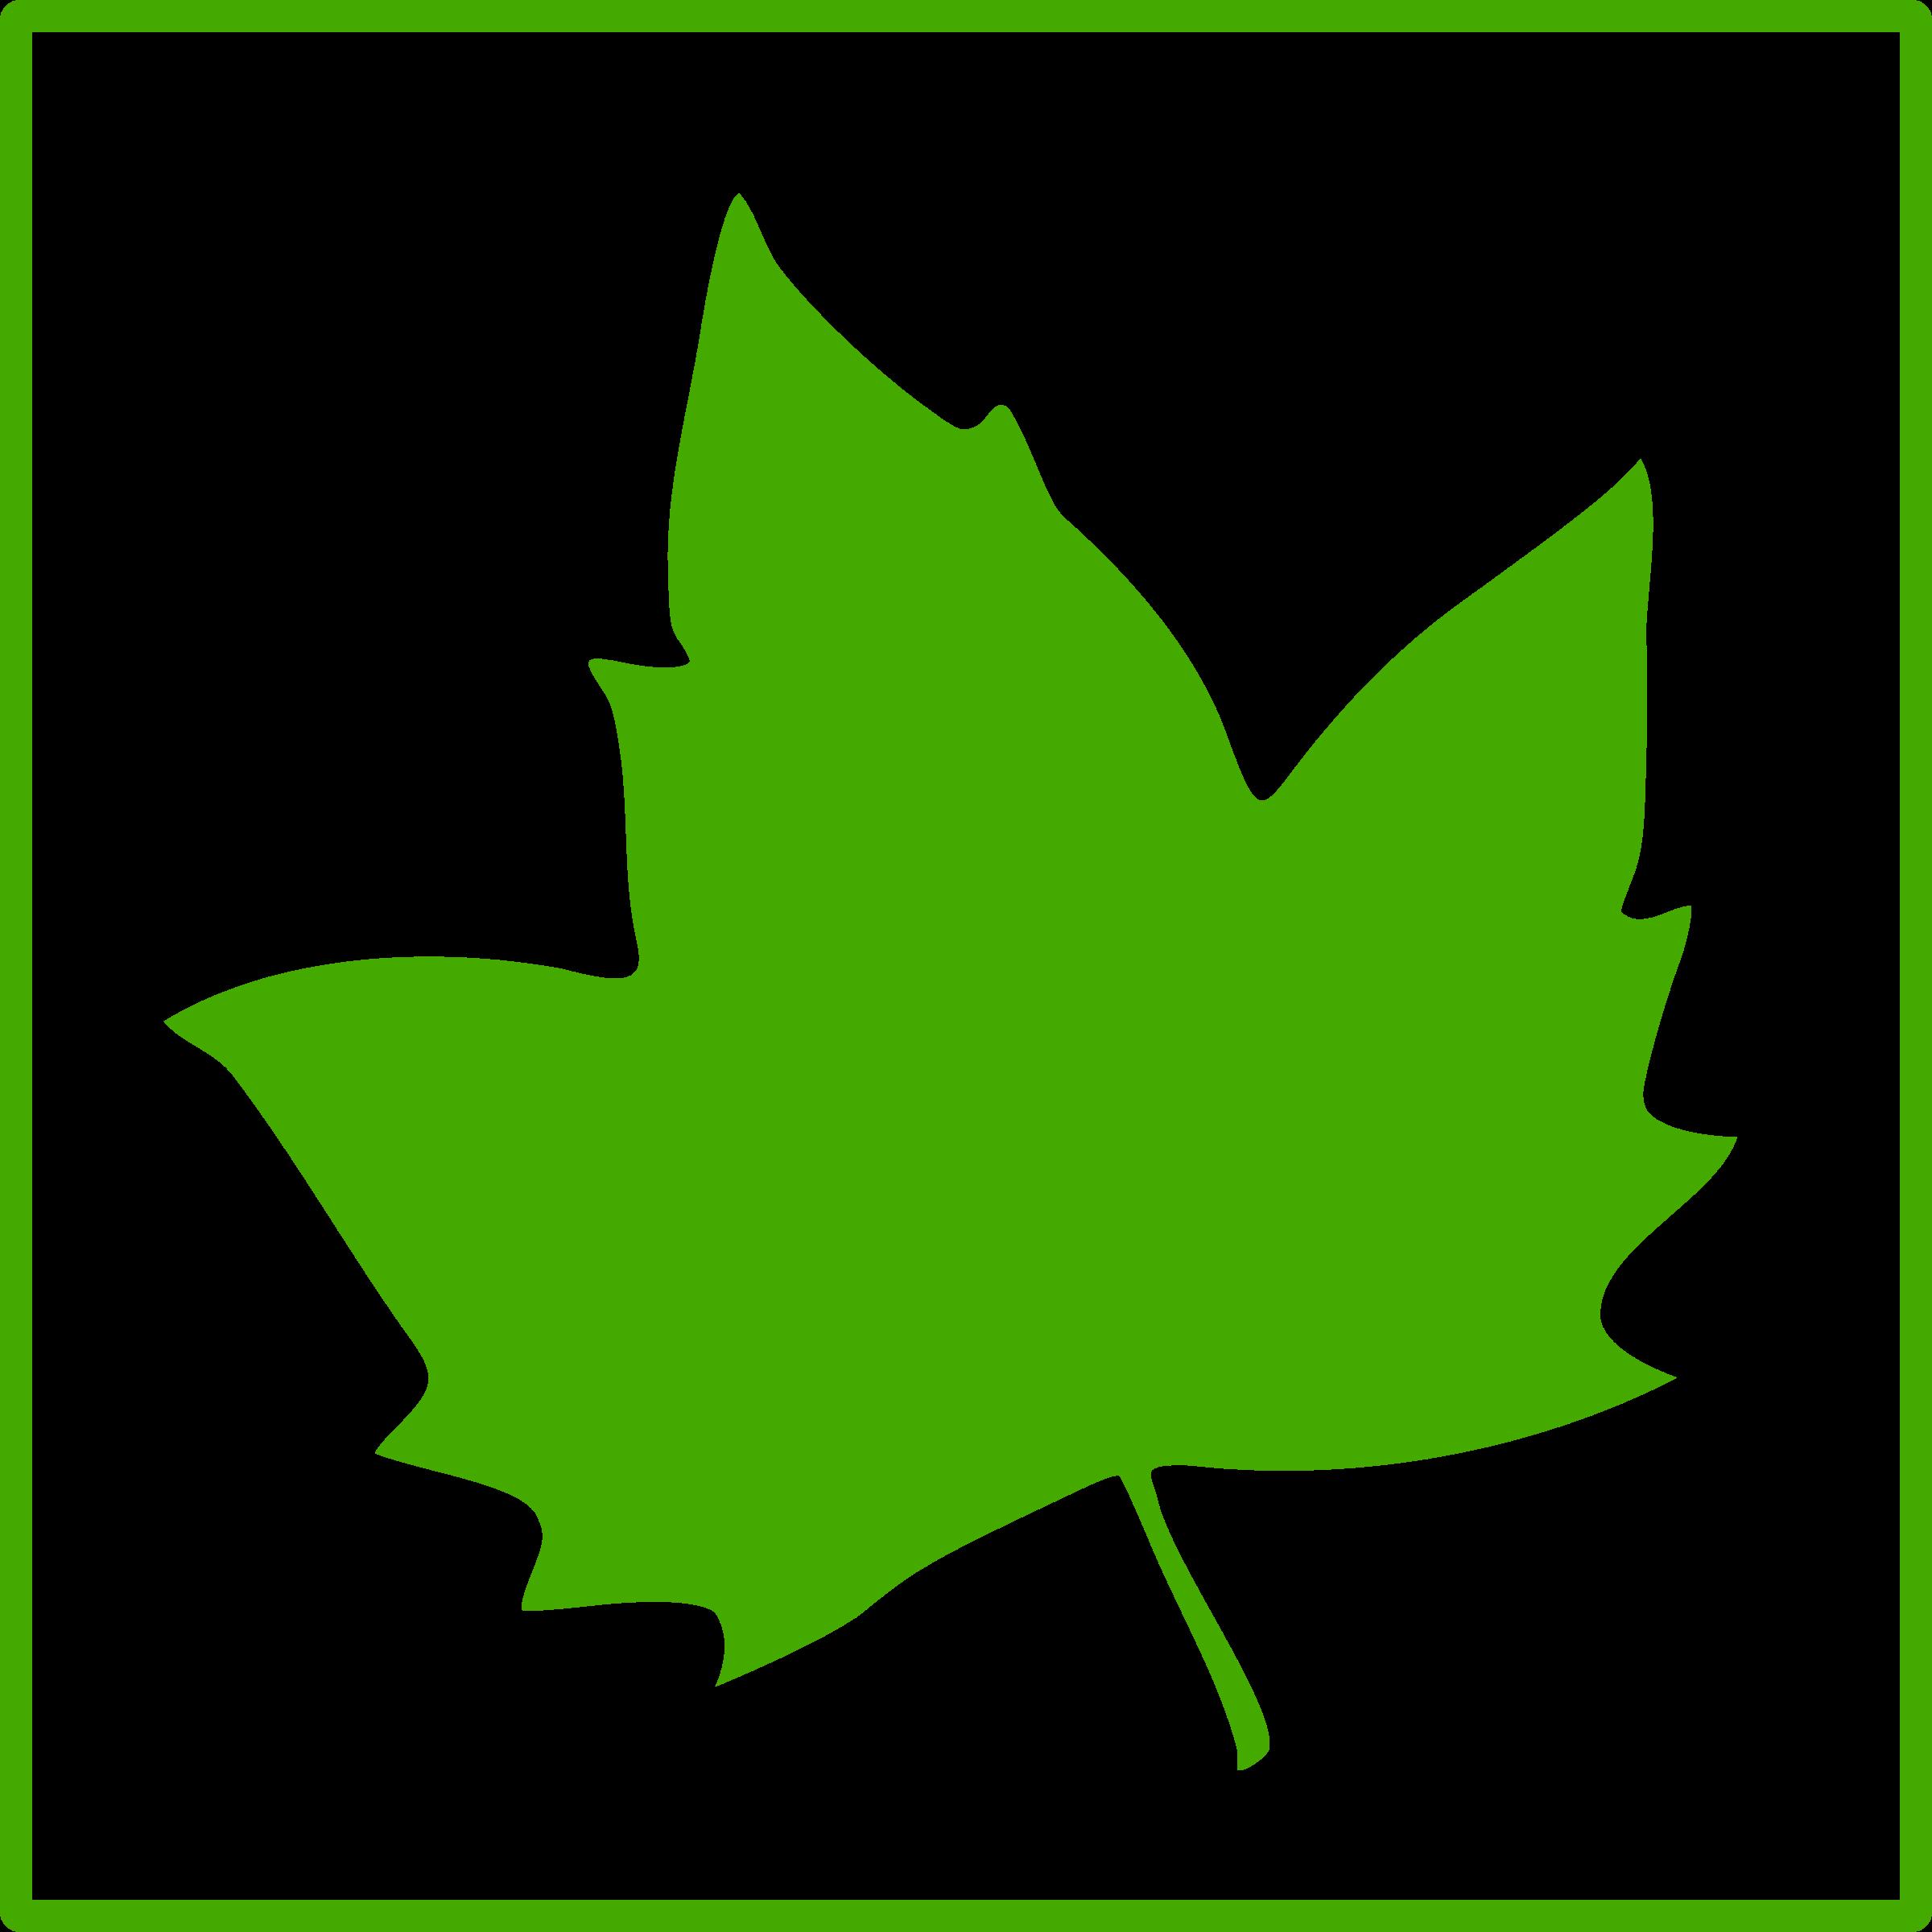 Eco green big image. Leaf clipart icon